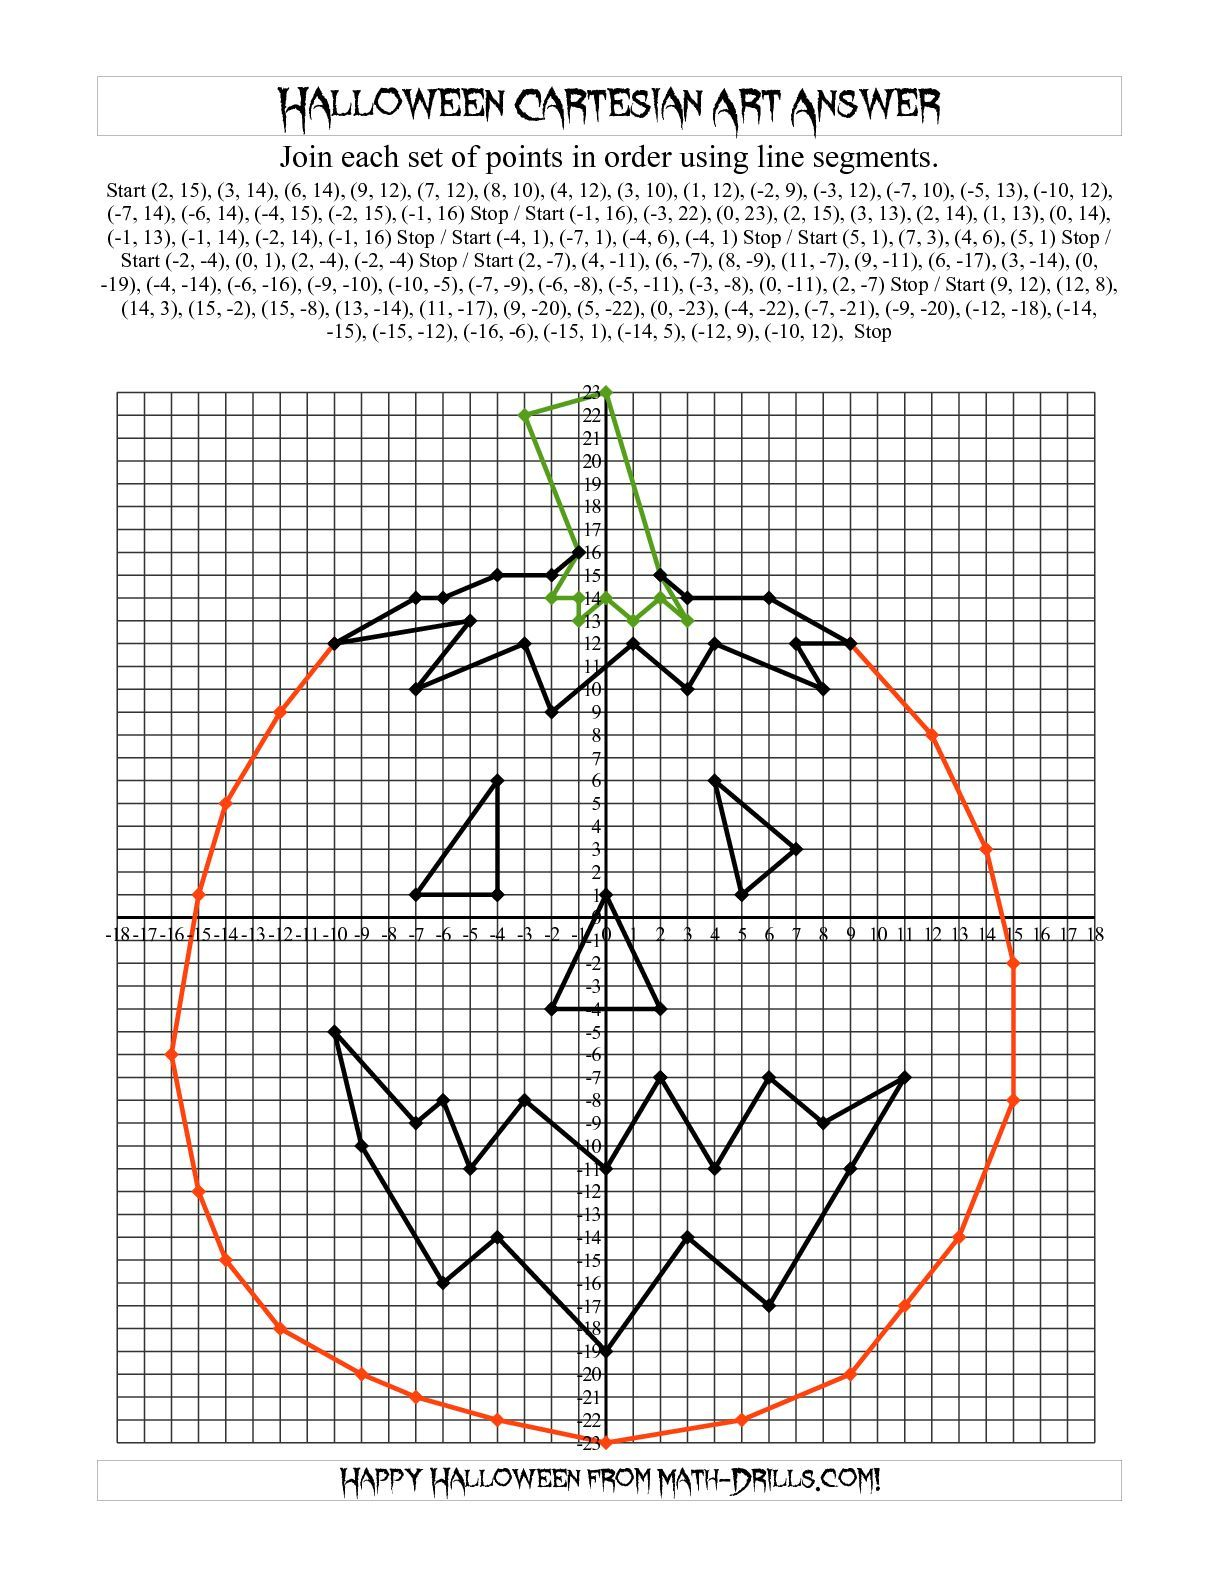 The Cartesian Art Halloween Jack-O-Lantern Math Worksheet